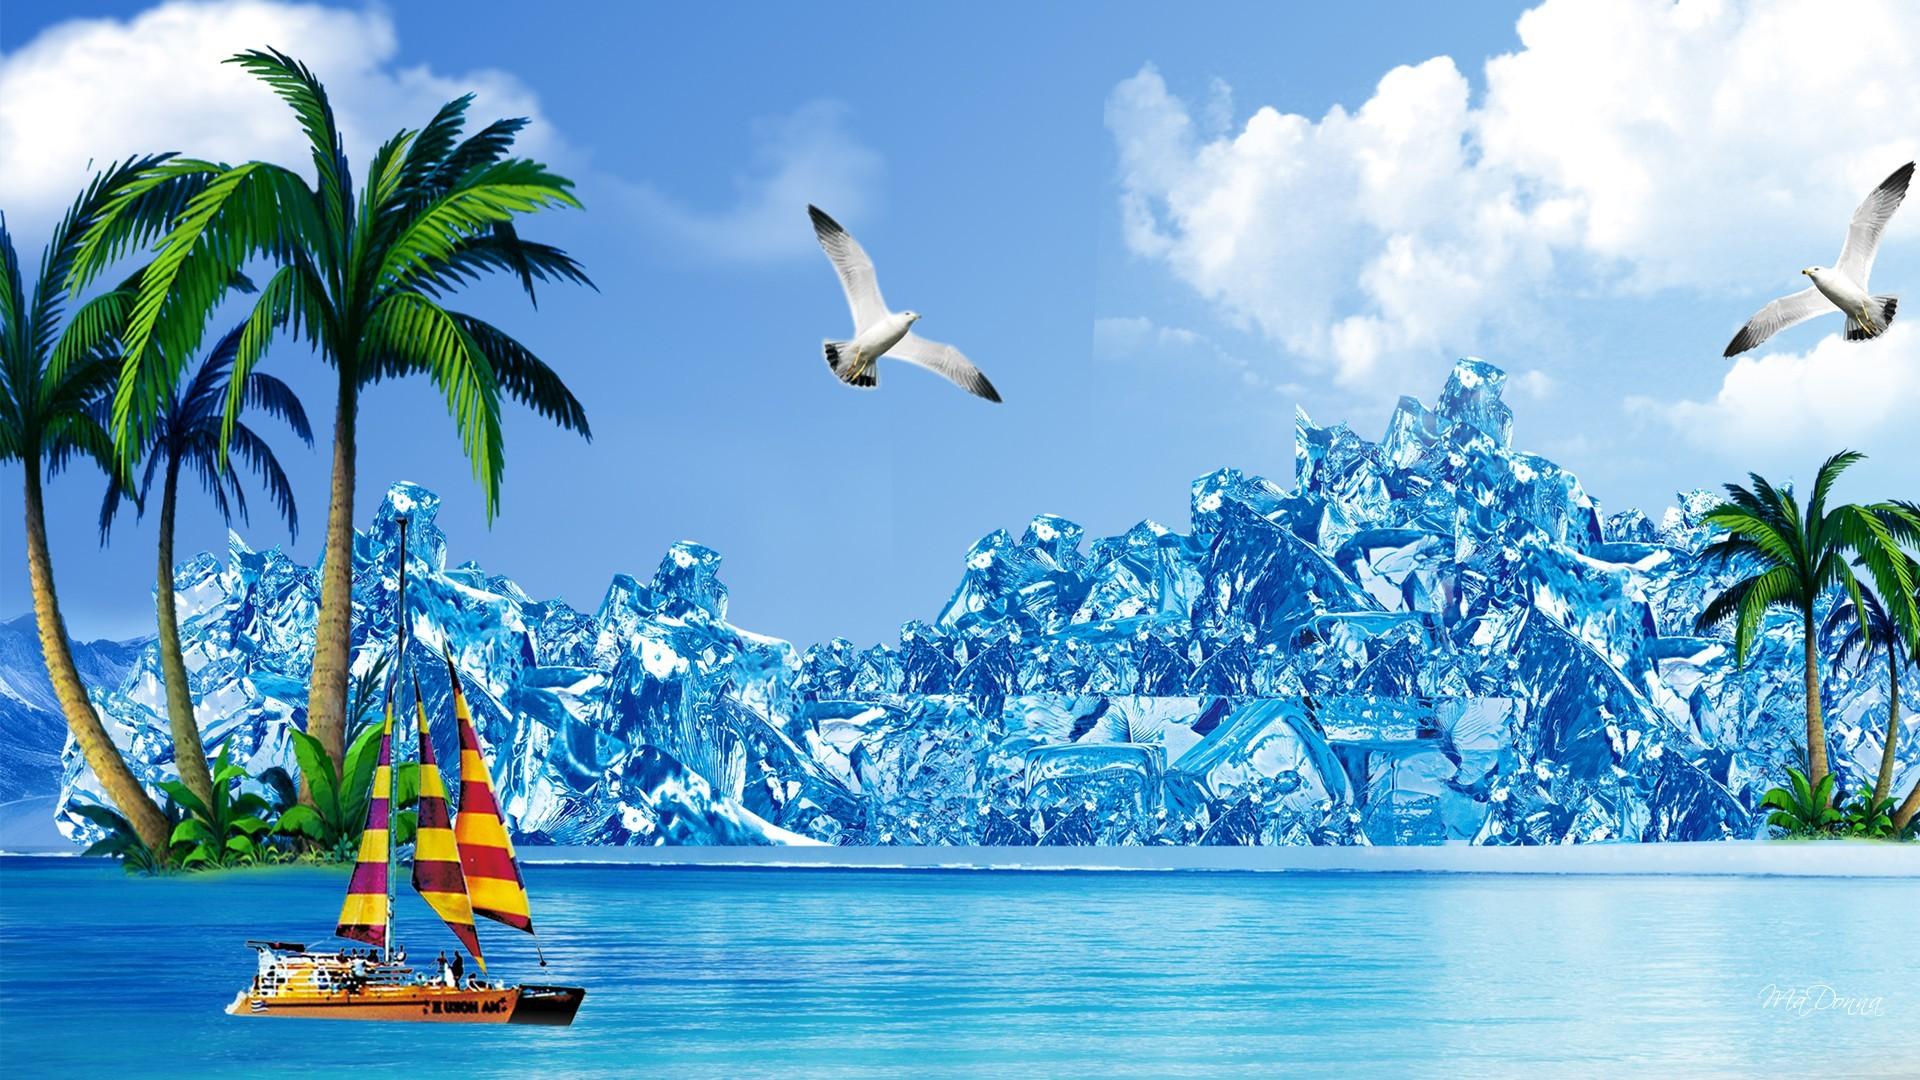 summer background wallpaper 68 images